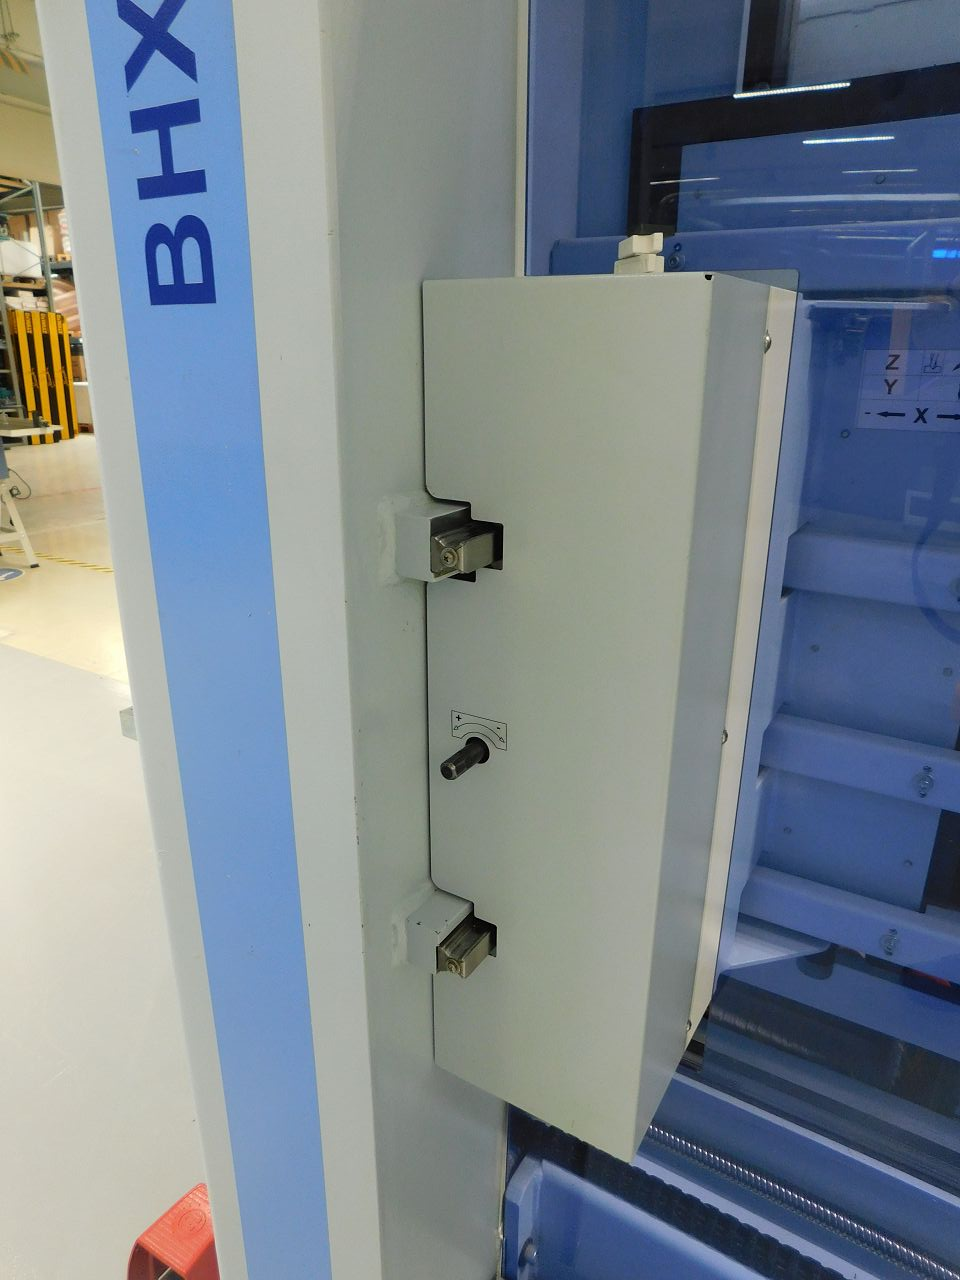 CNC Bearbeitungszentrum BHX 050 Weeke  4 .JPGCNC Bearbeitungszentrum BHX 050 Weeke  4